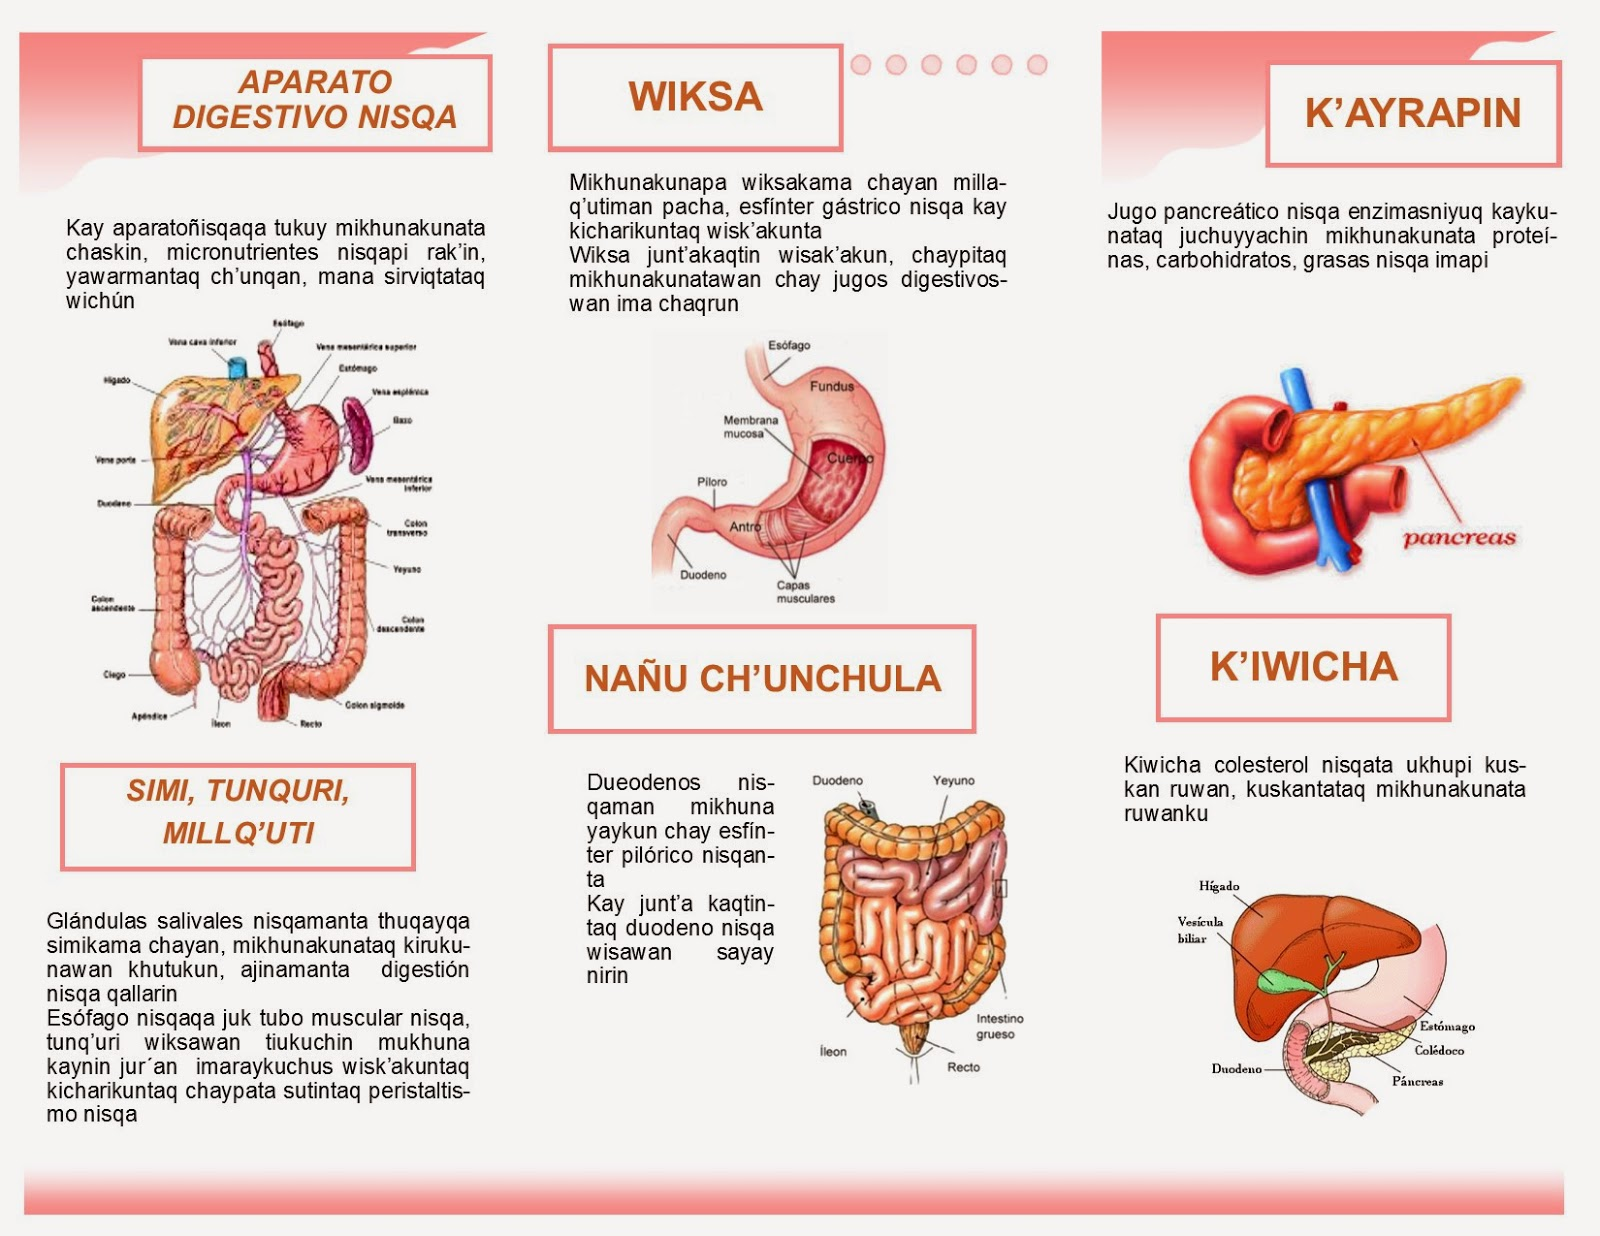 Enfermedades del sistema digestivo en pdf _ Updated - 54298272